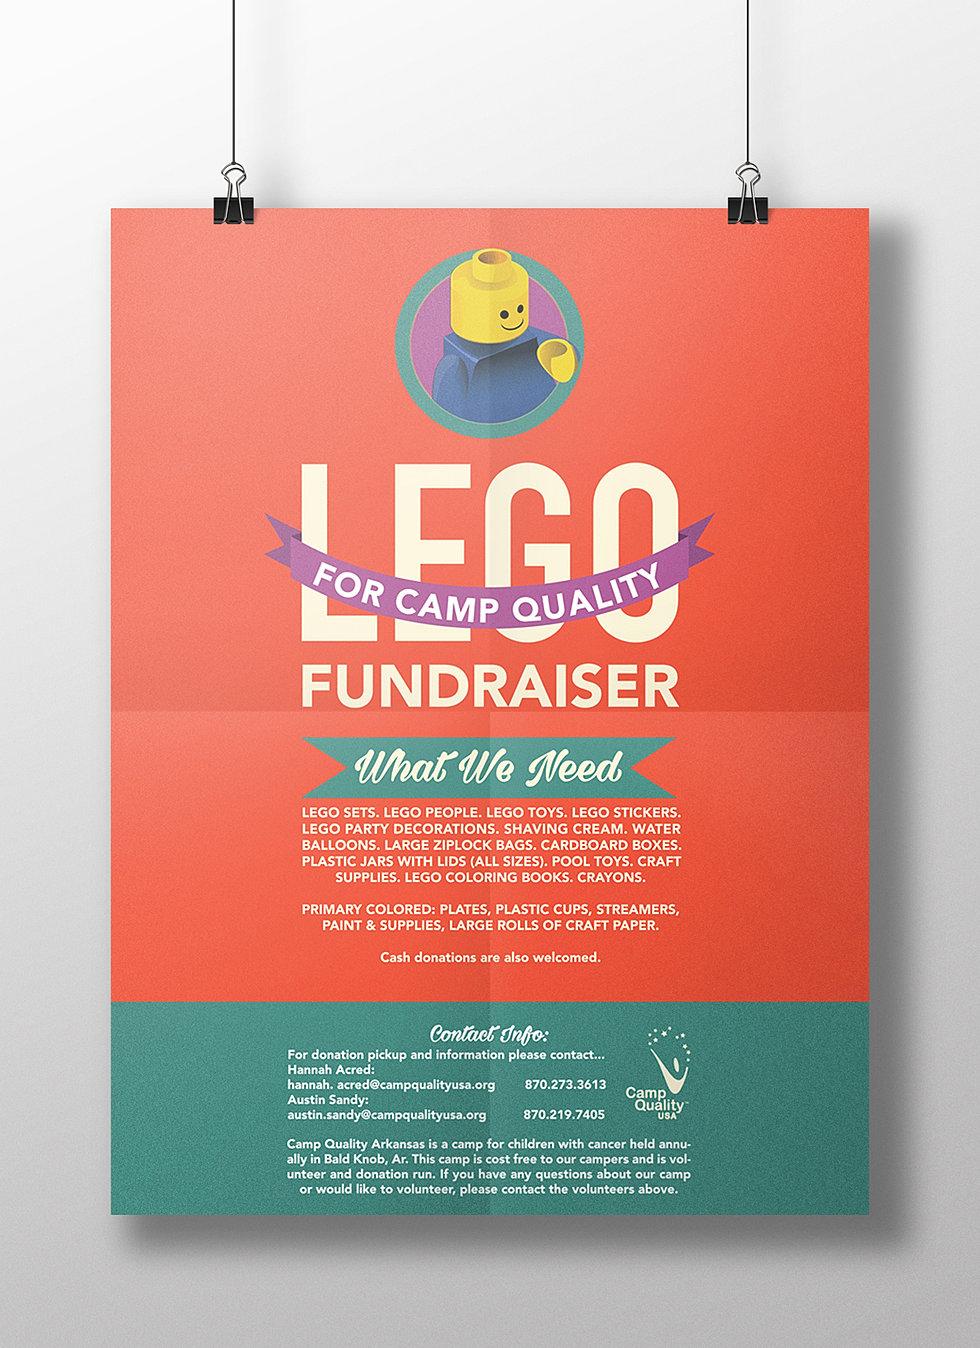 Poster design volunteer - Camp Quality Fundraiser